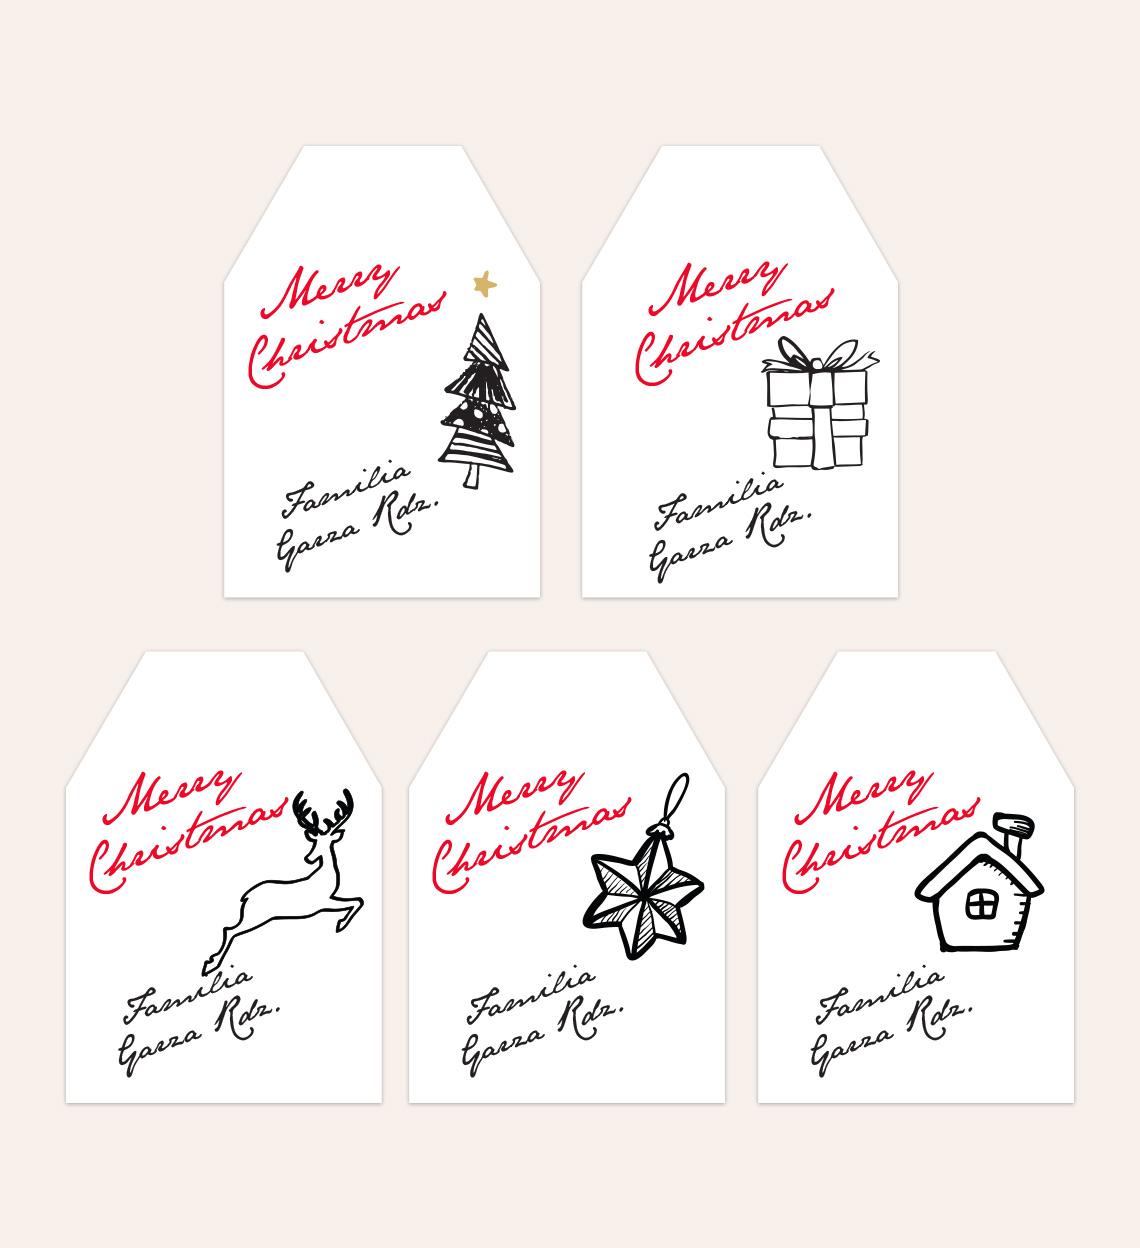 Diseño Etiquetas Dibujos Navideños